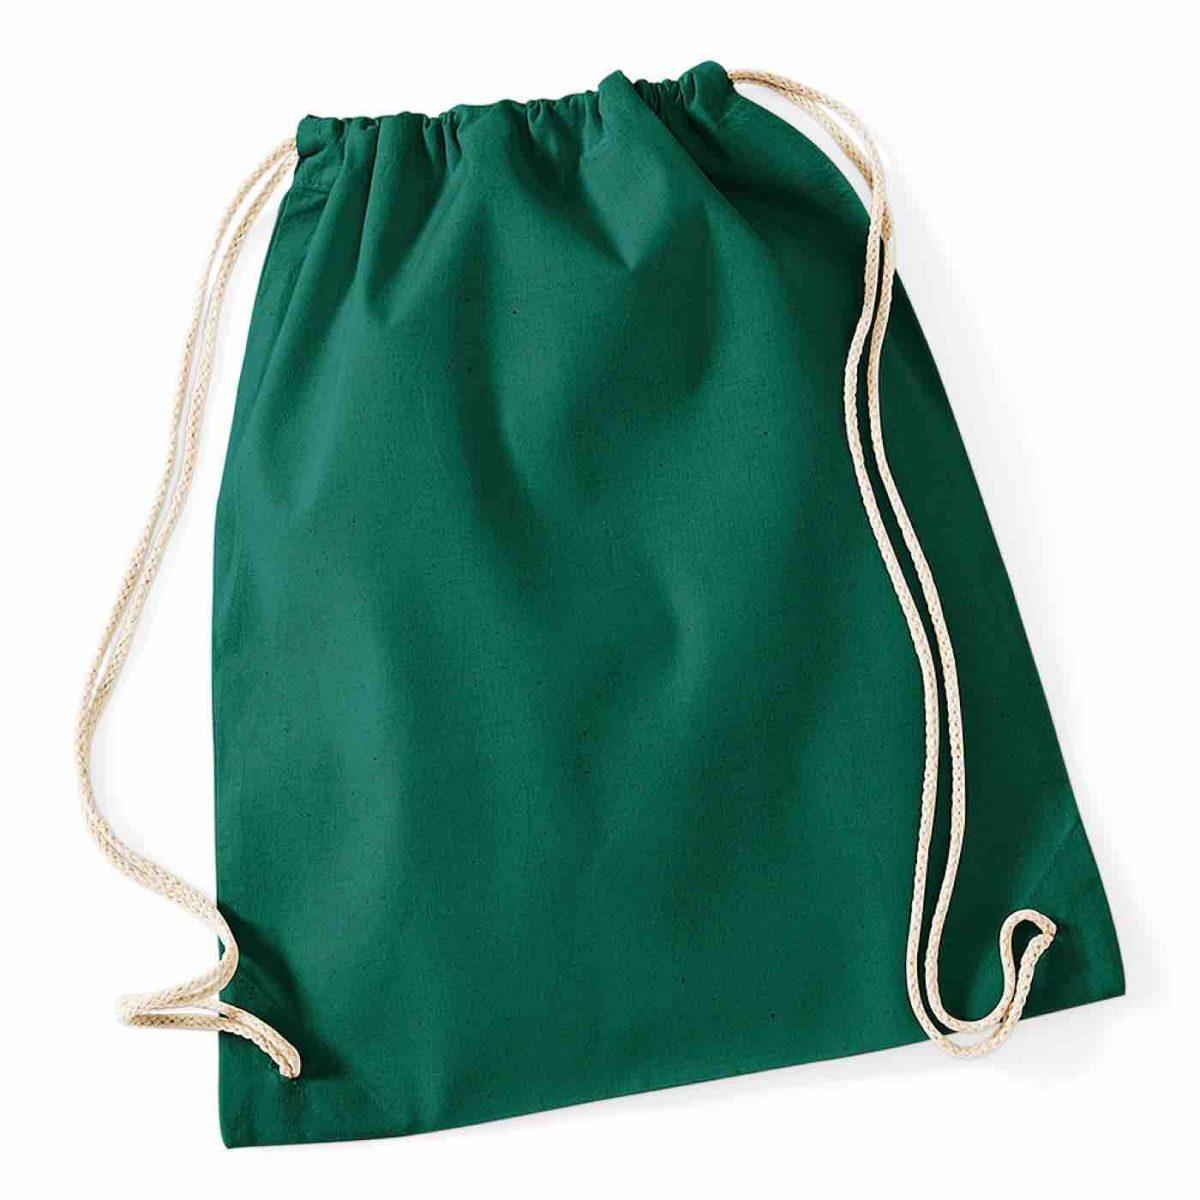 Bottlegreen Cotton Tote Bag